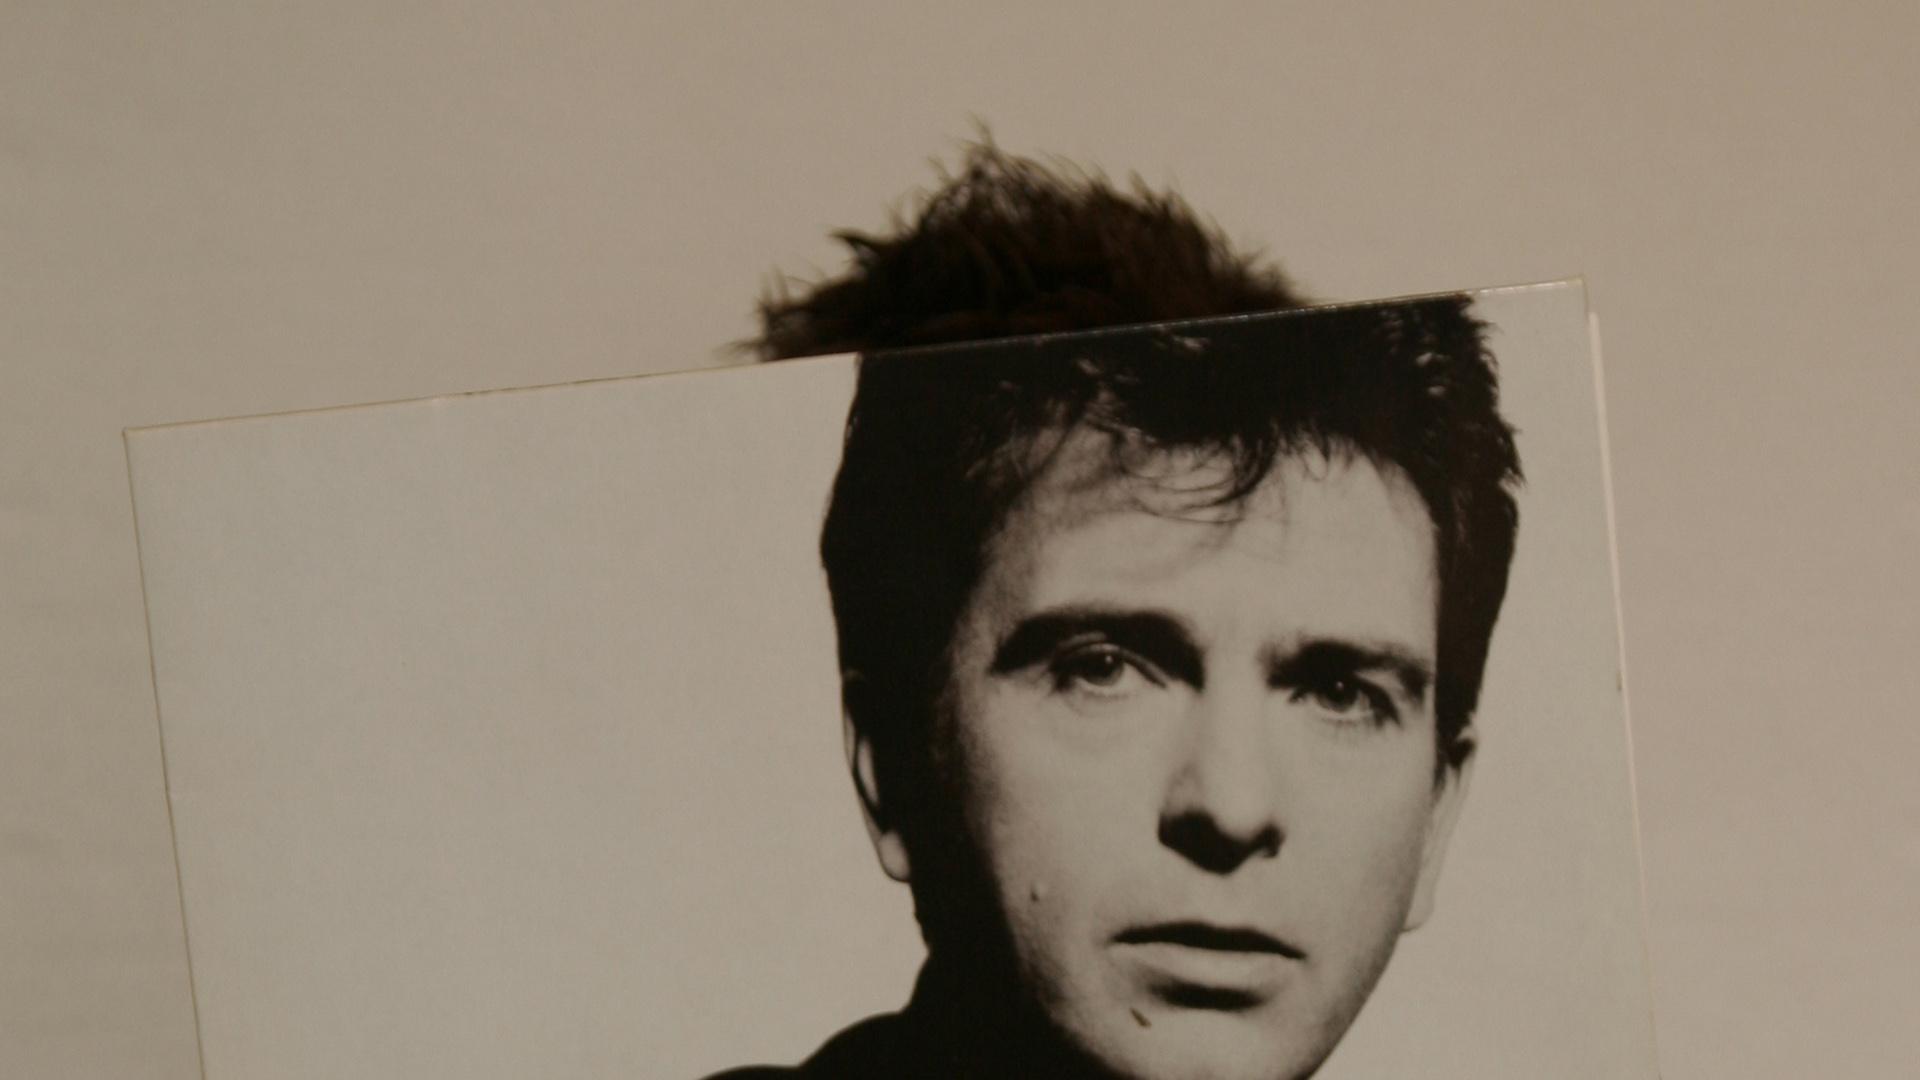 Direct Link: Peter Gabriel